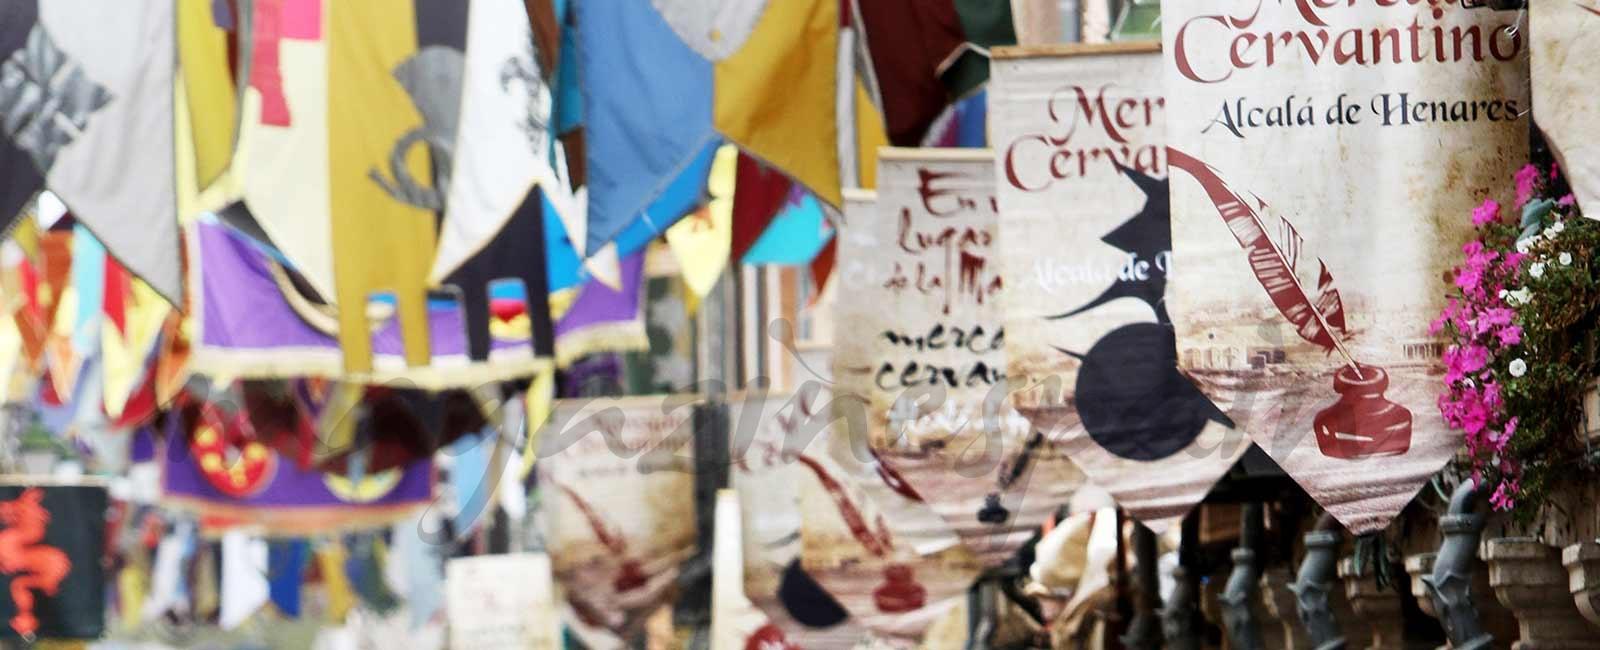 Mercado Cervantino de Alcalá de Henares – Vídeo